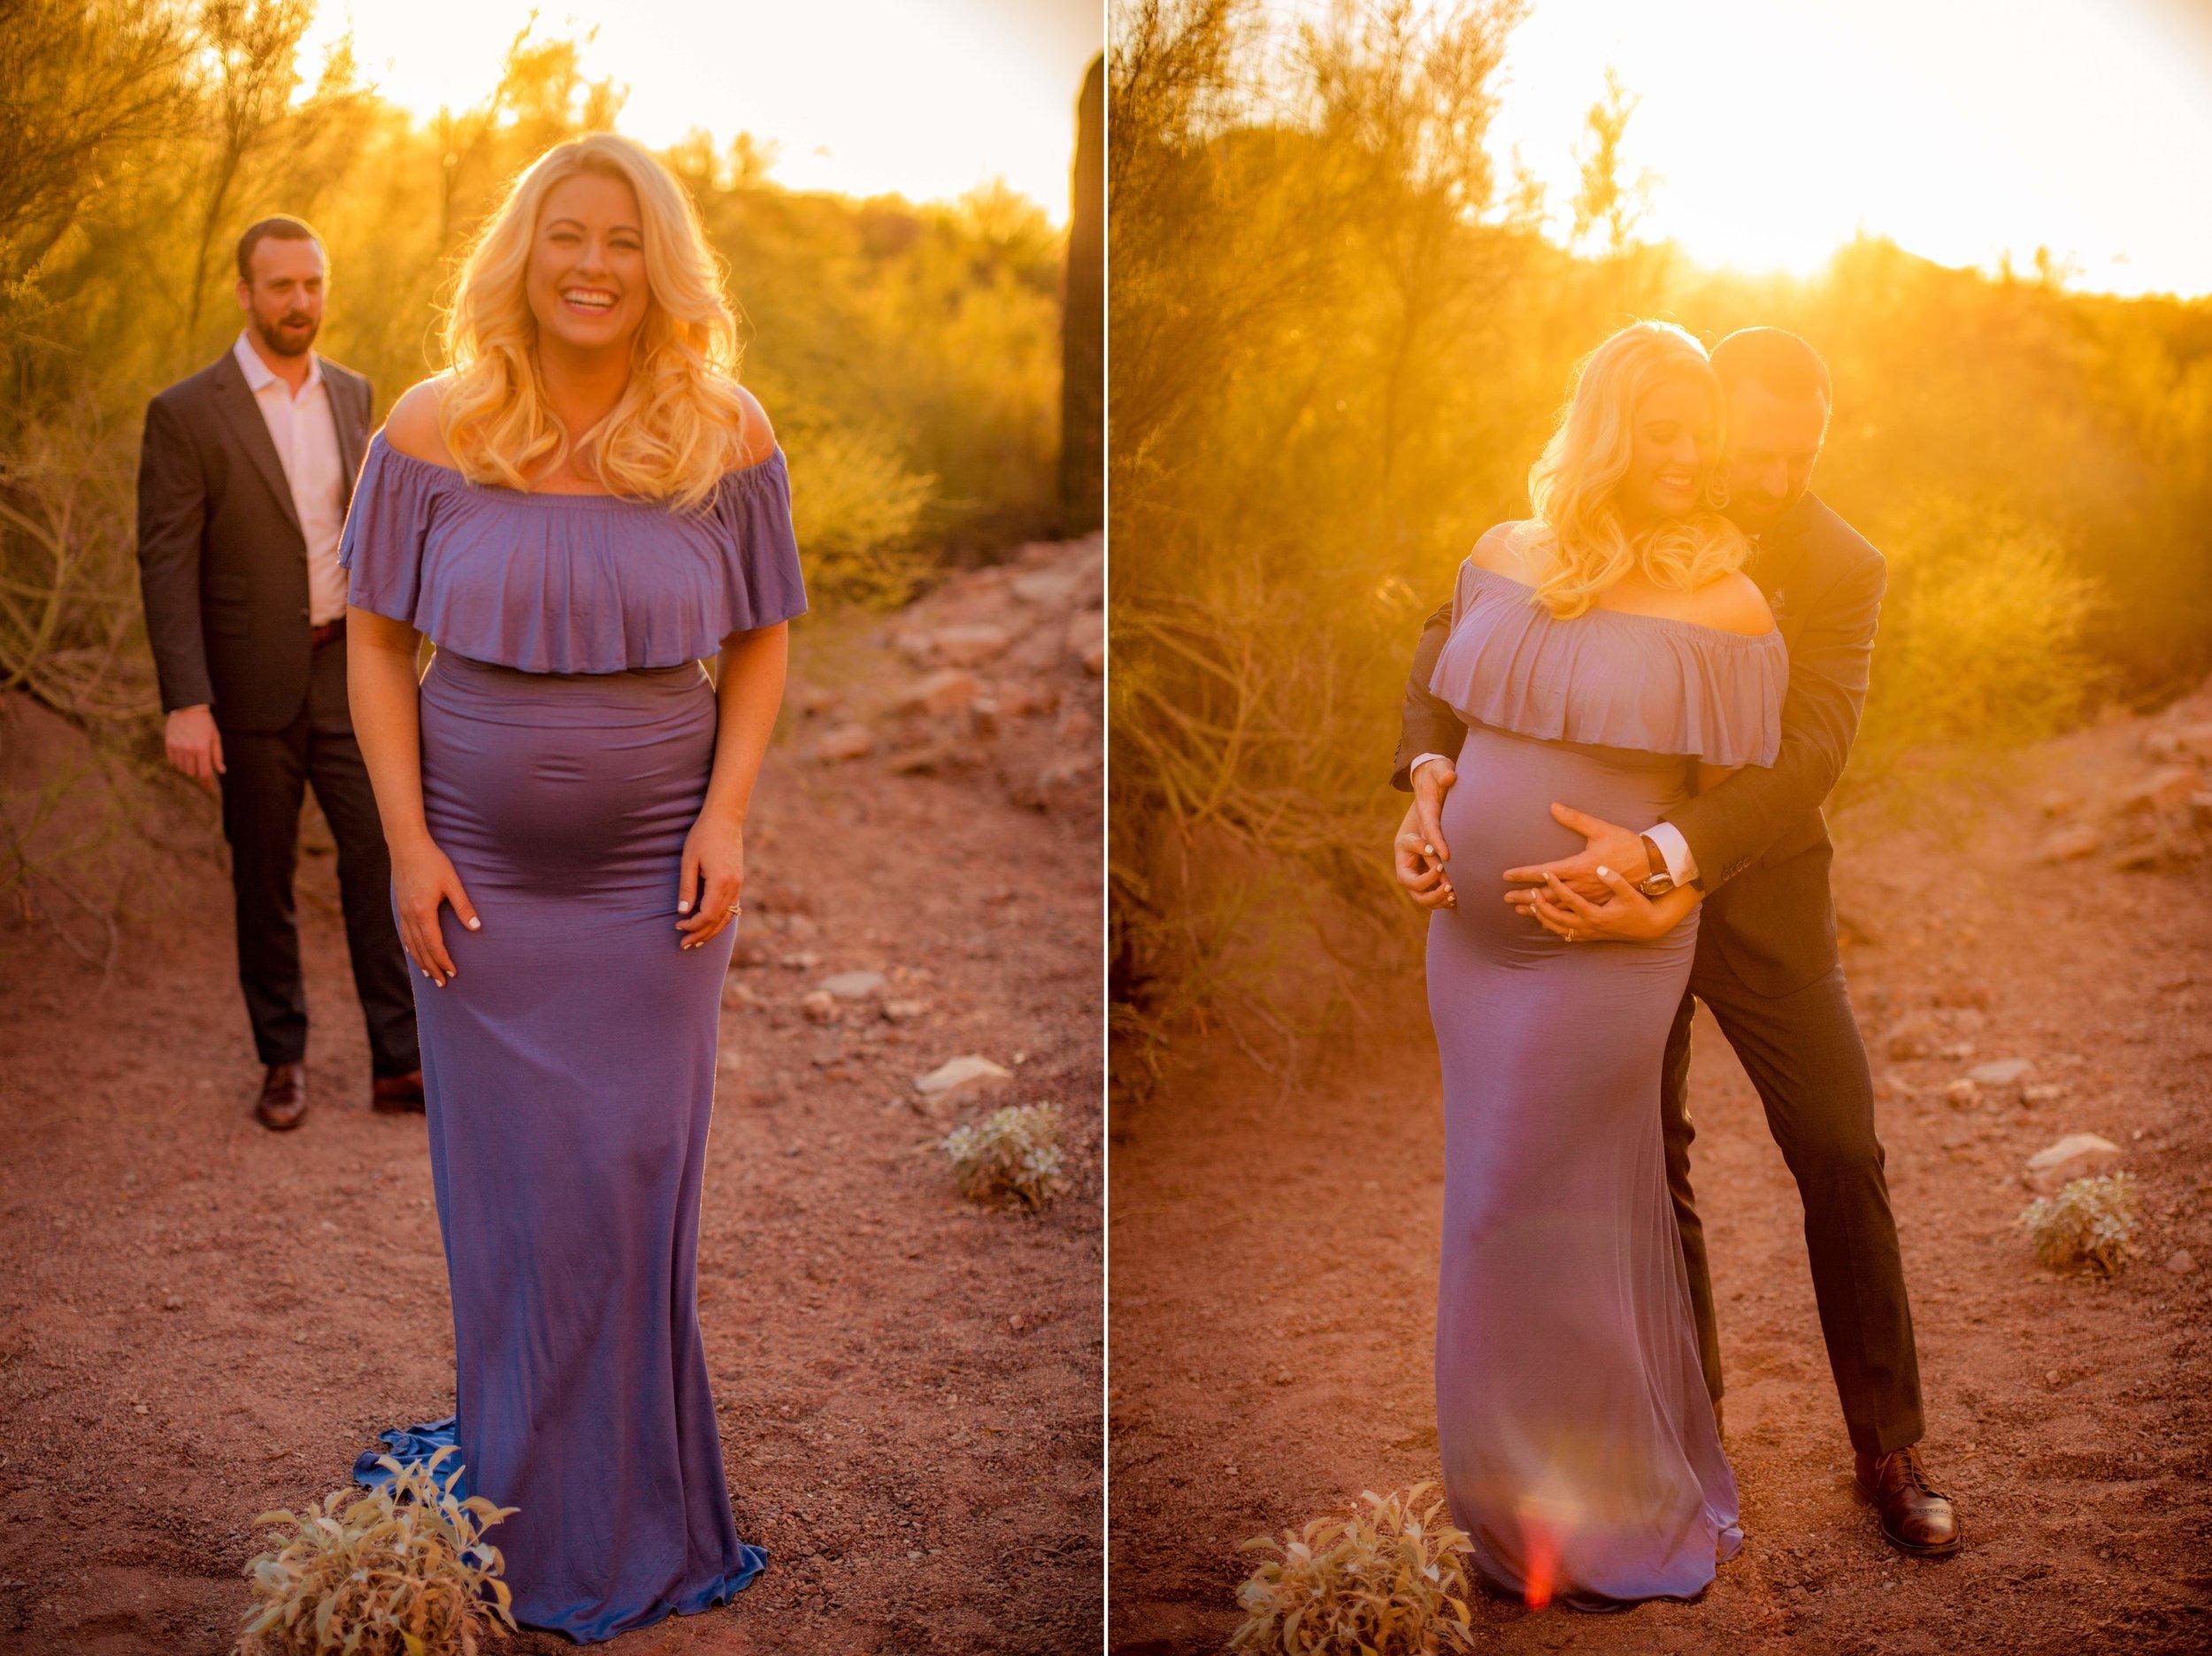 -colorado-wedding-photographer-denver-springs-vail-607A0127 copy.jpeg